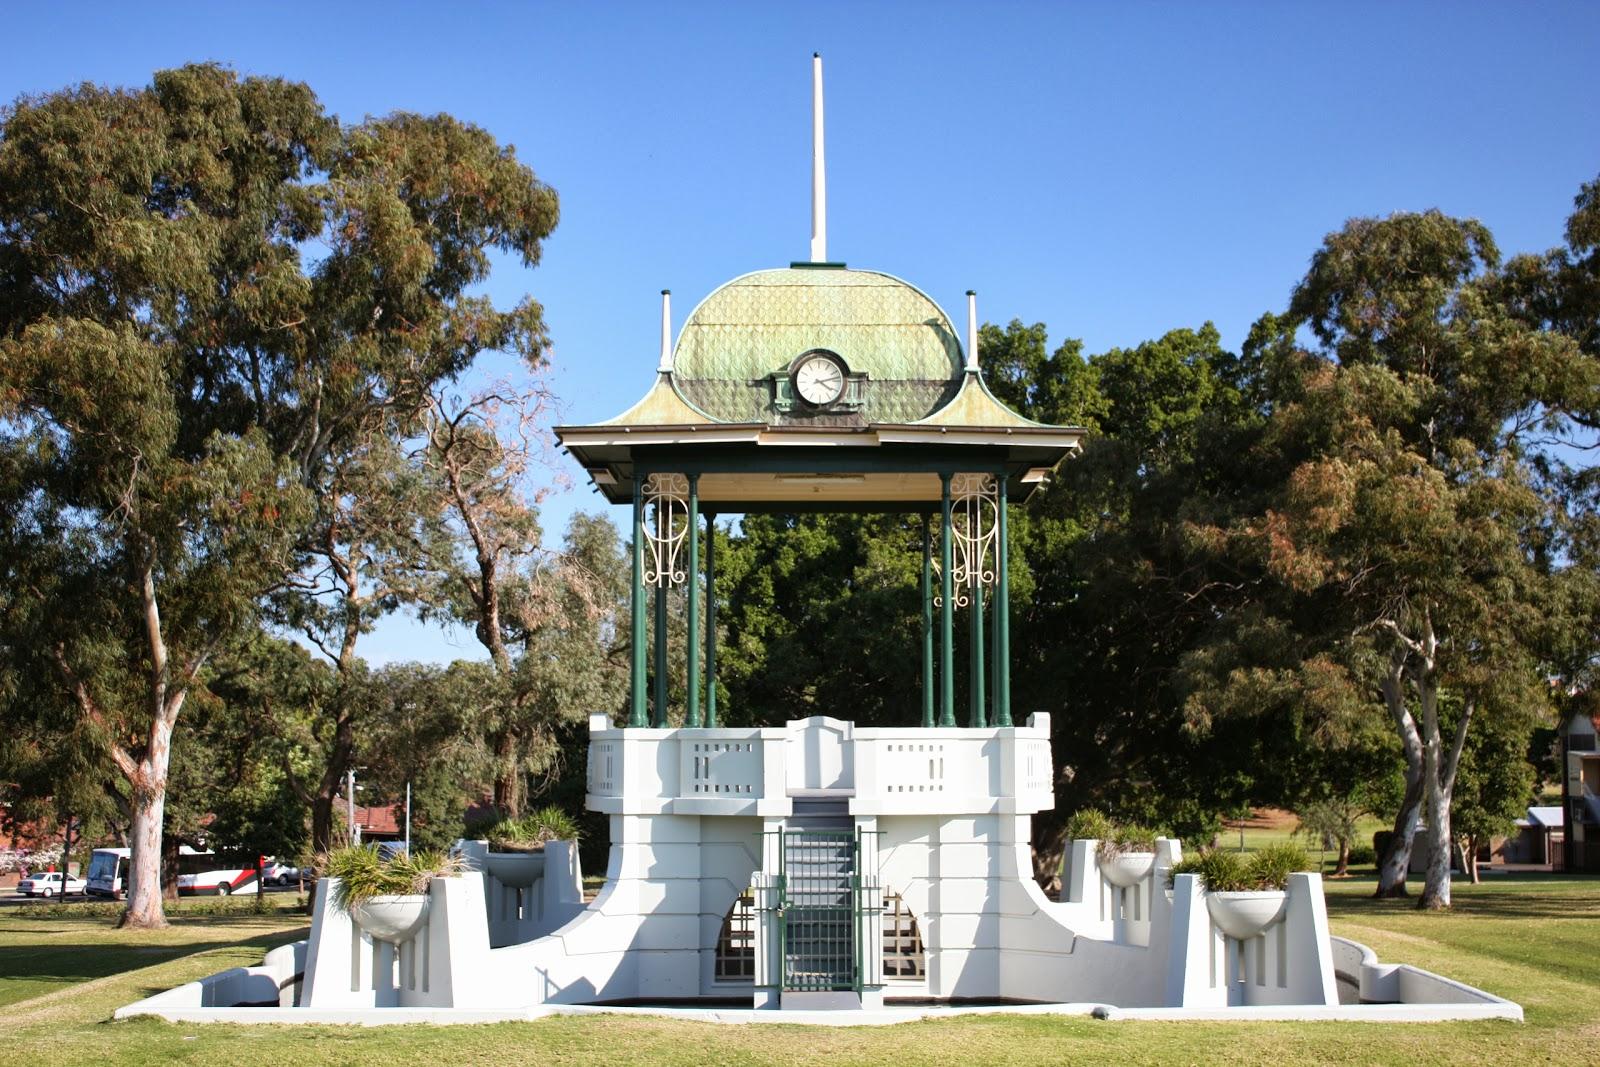 Ashfield bandstand